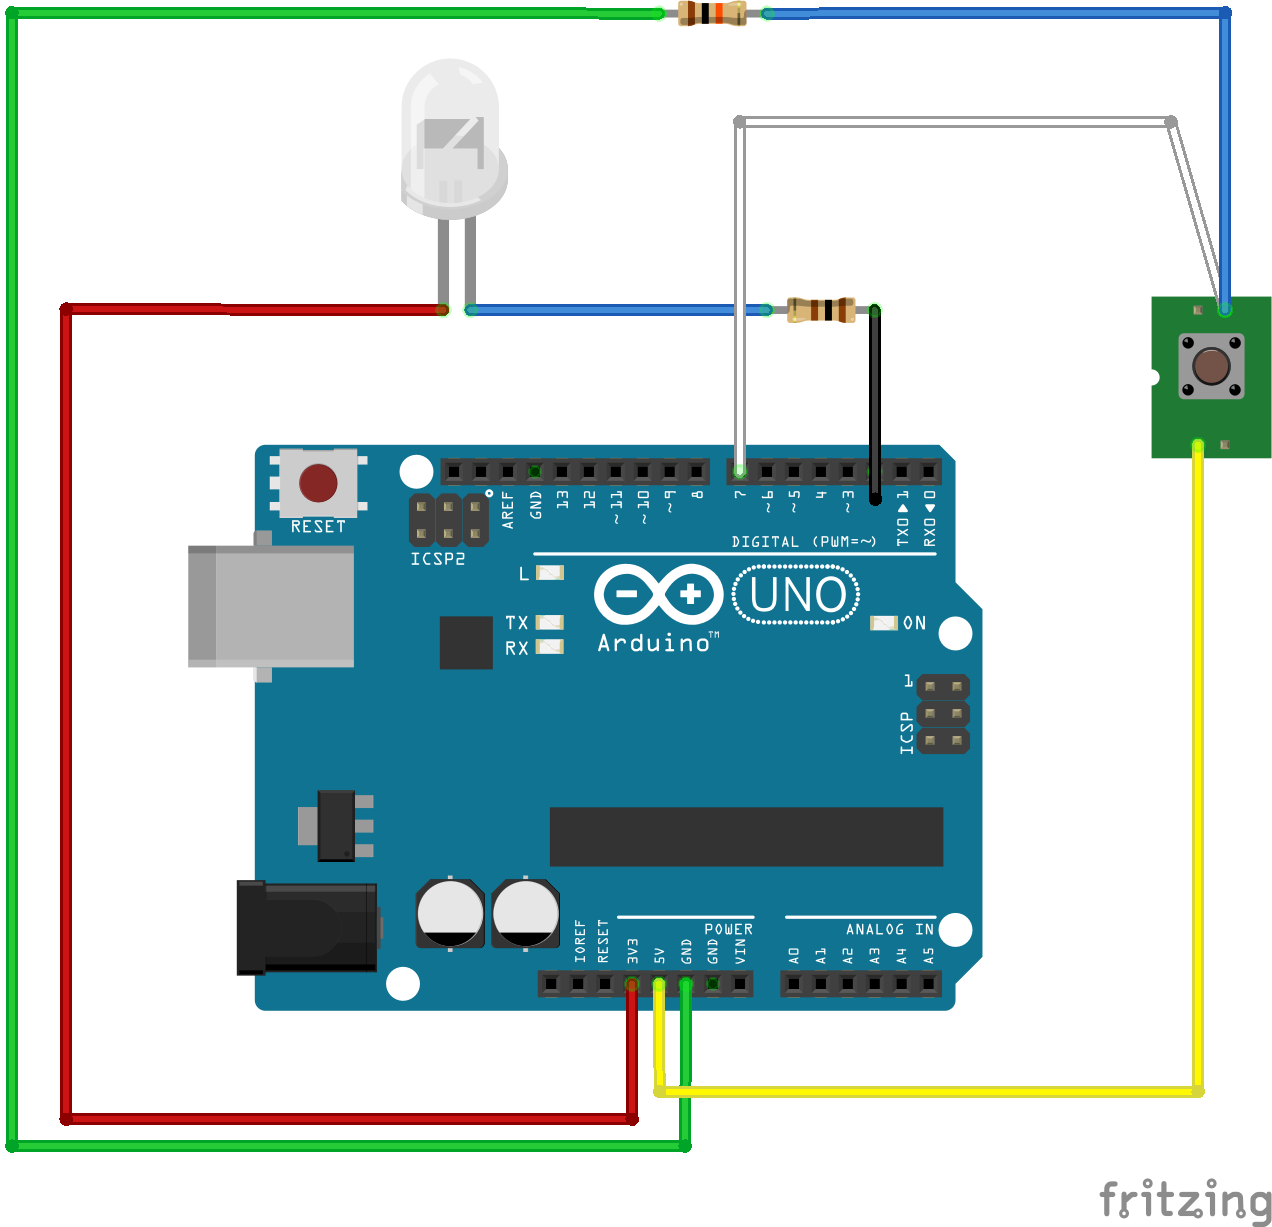 Push Button Schematic Diagram - Data Wiring Diagrams •